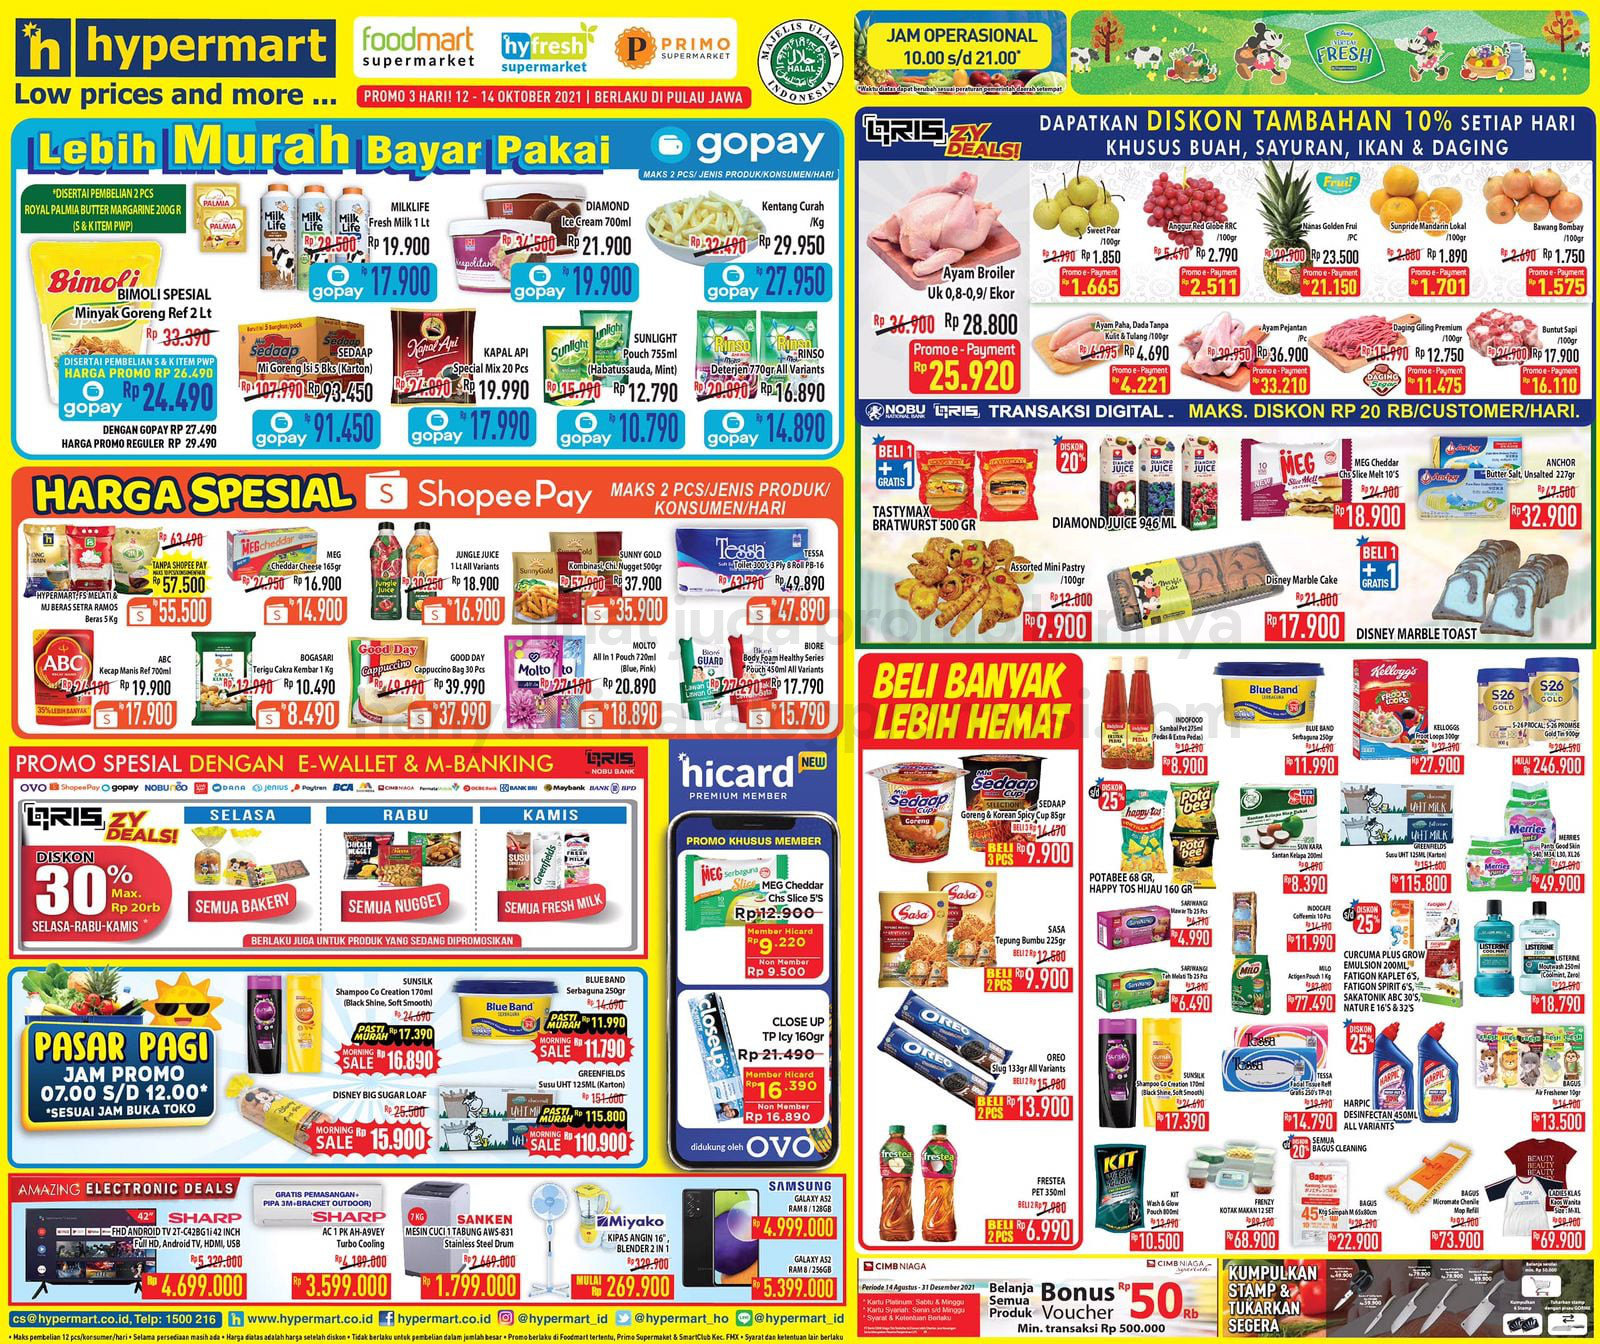 Katalog Hypermart Promo Weekday periode 12-14 Oktober 2021